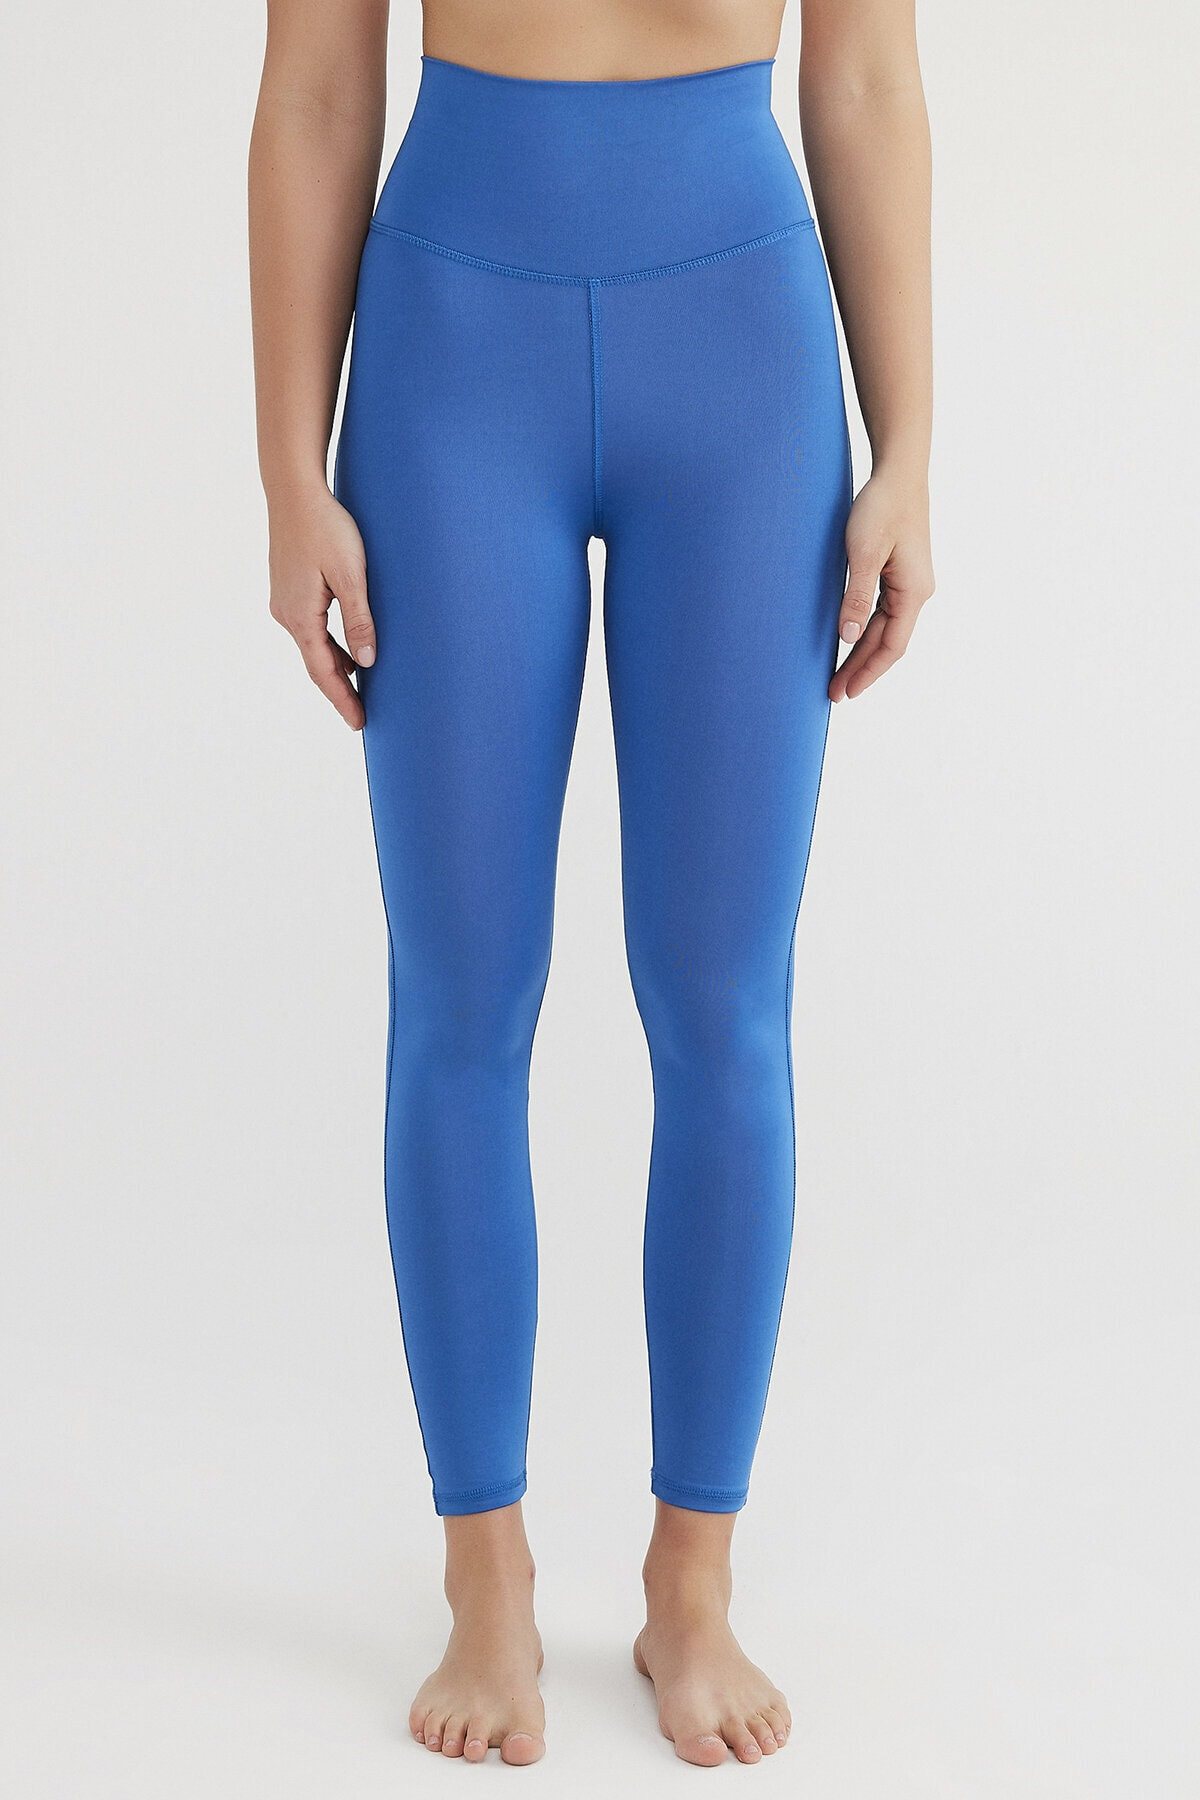 Penti Kadın Mavi Süper Stretchy Yüksek Bel Tayt